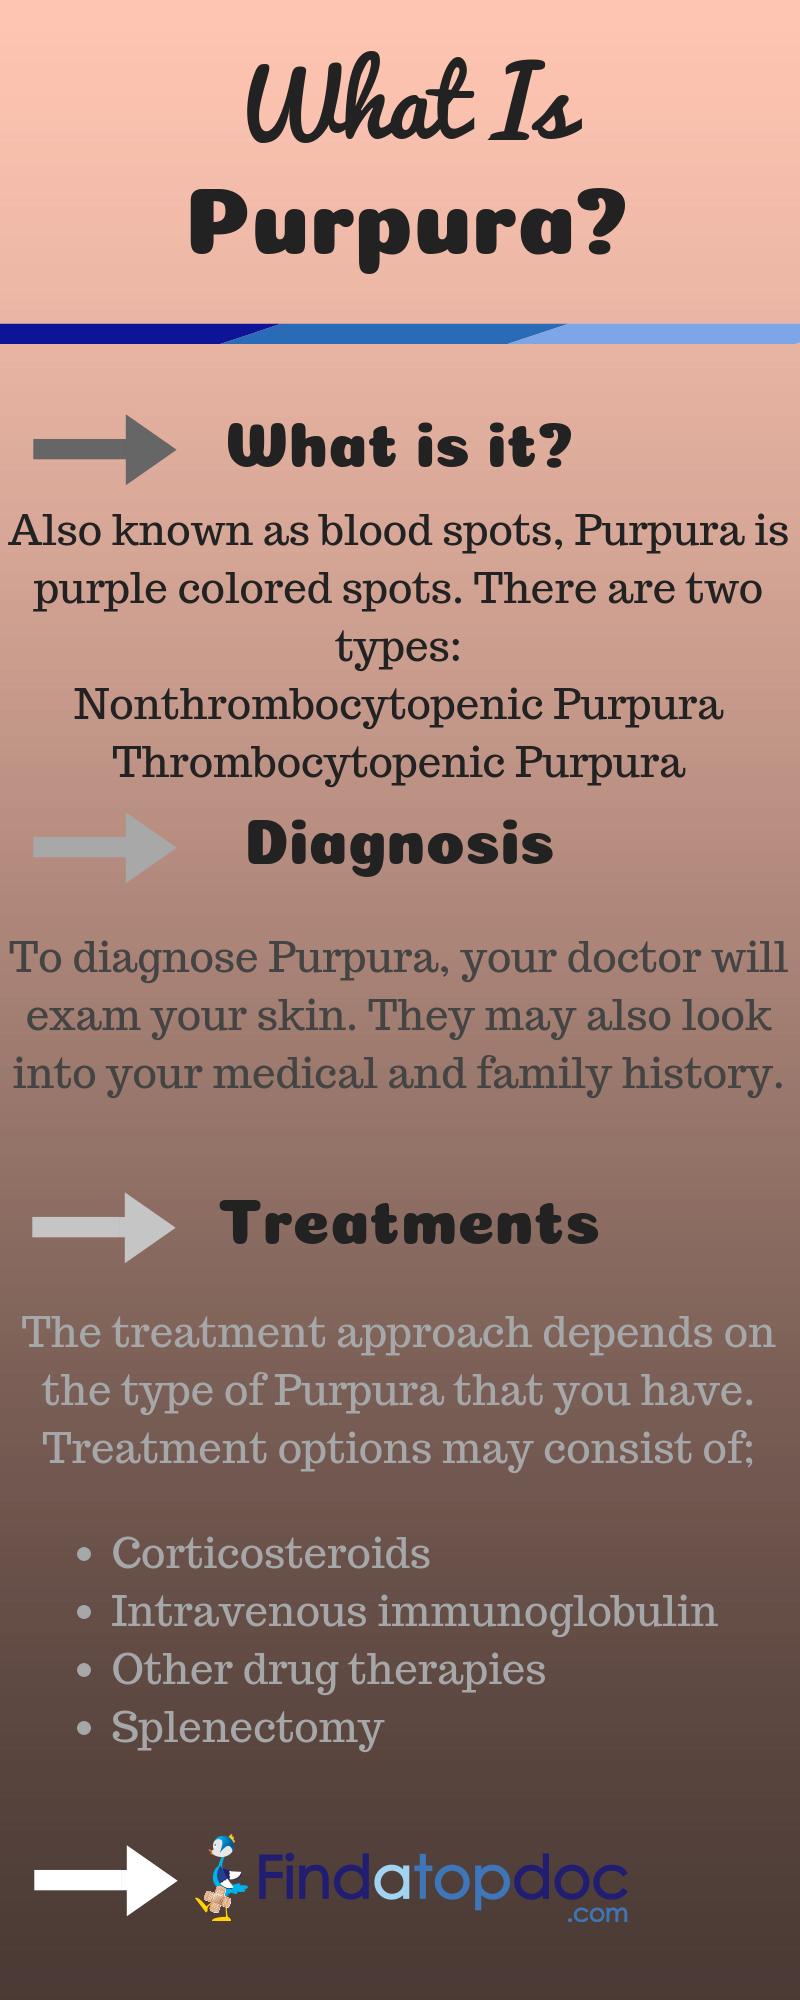 Idiopathic Thrombocytopenic Purpura: Symptoms, Causes